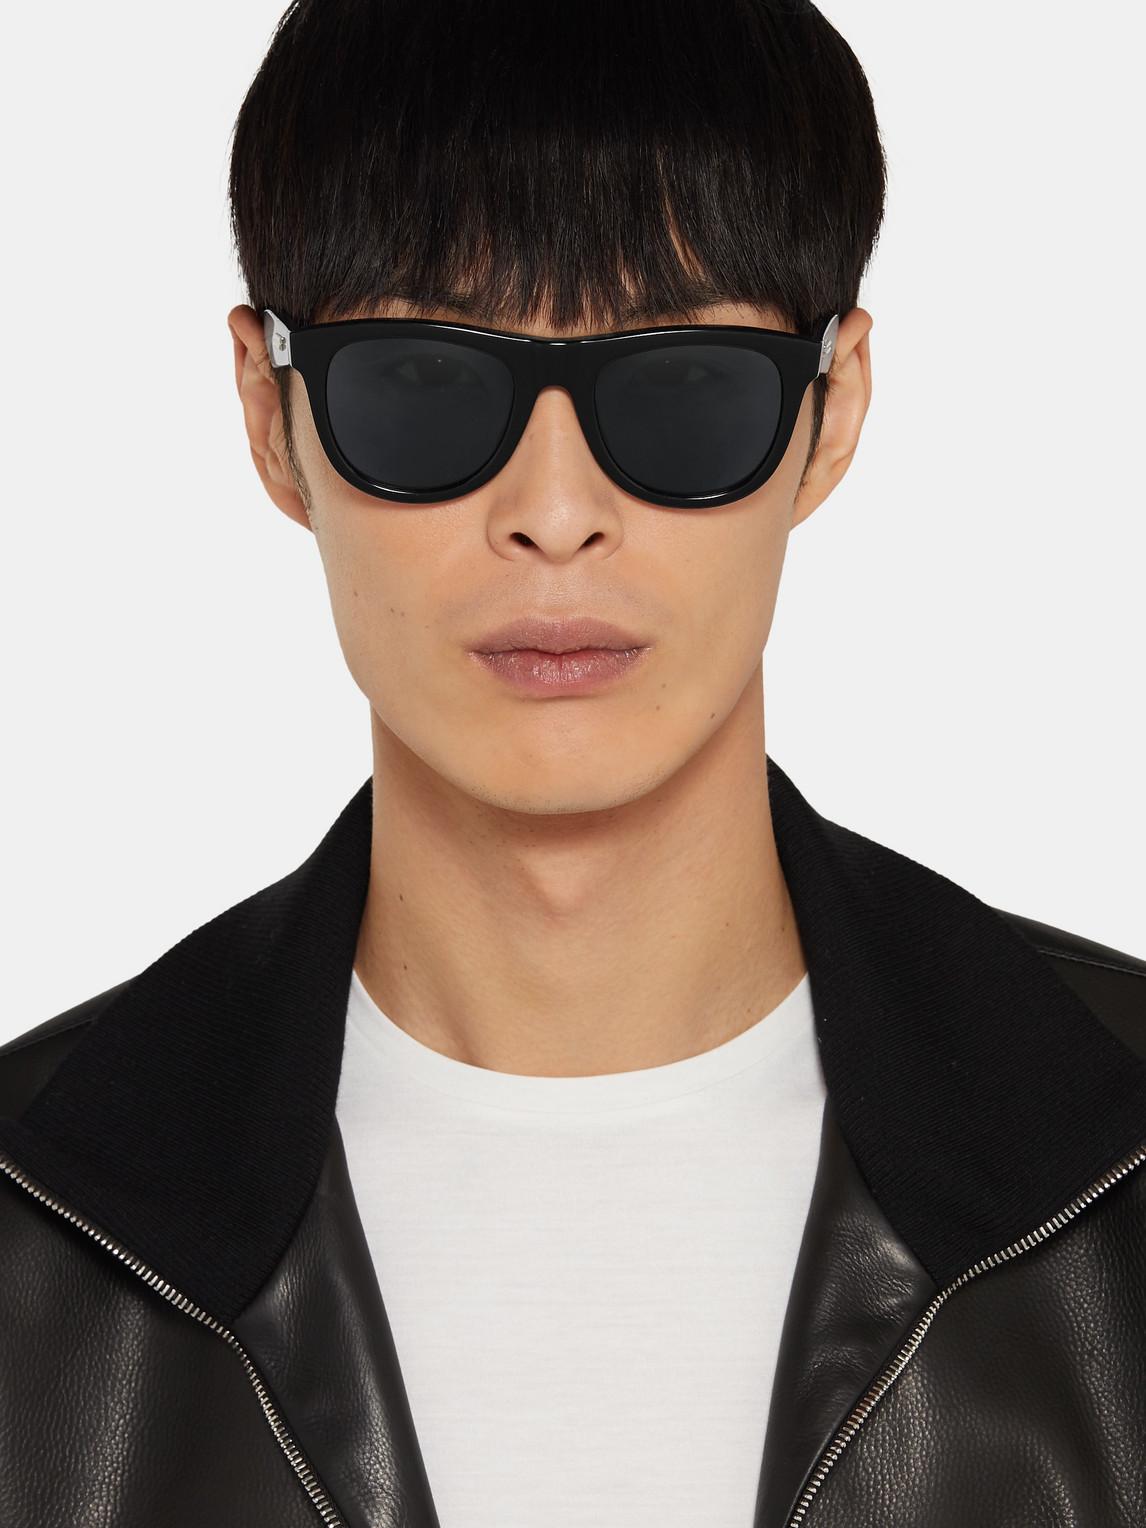 Bottega Veneta Sunglasses D-FRAME ACETATE SUNGLASSES